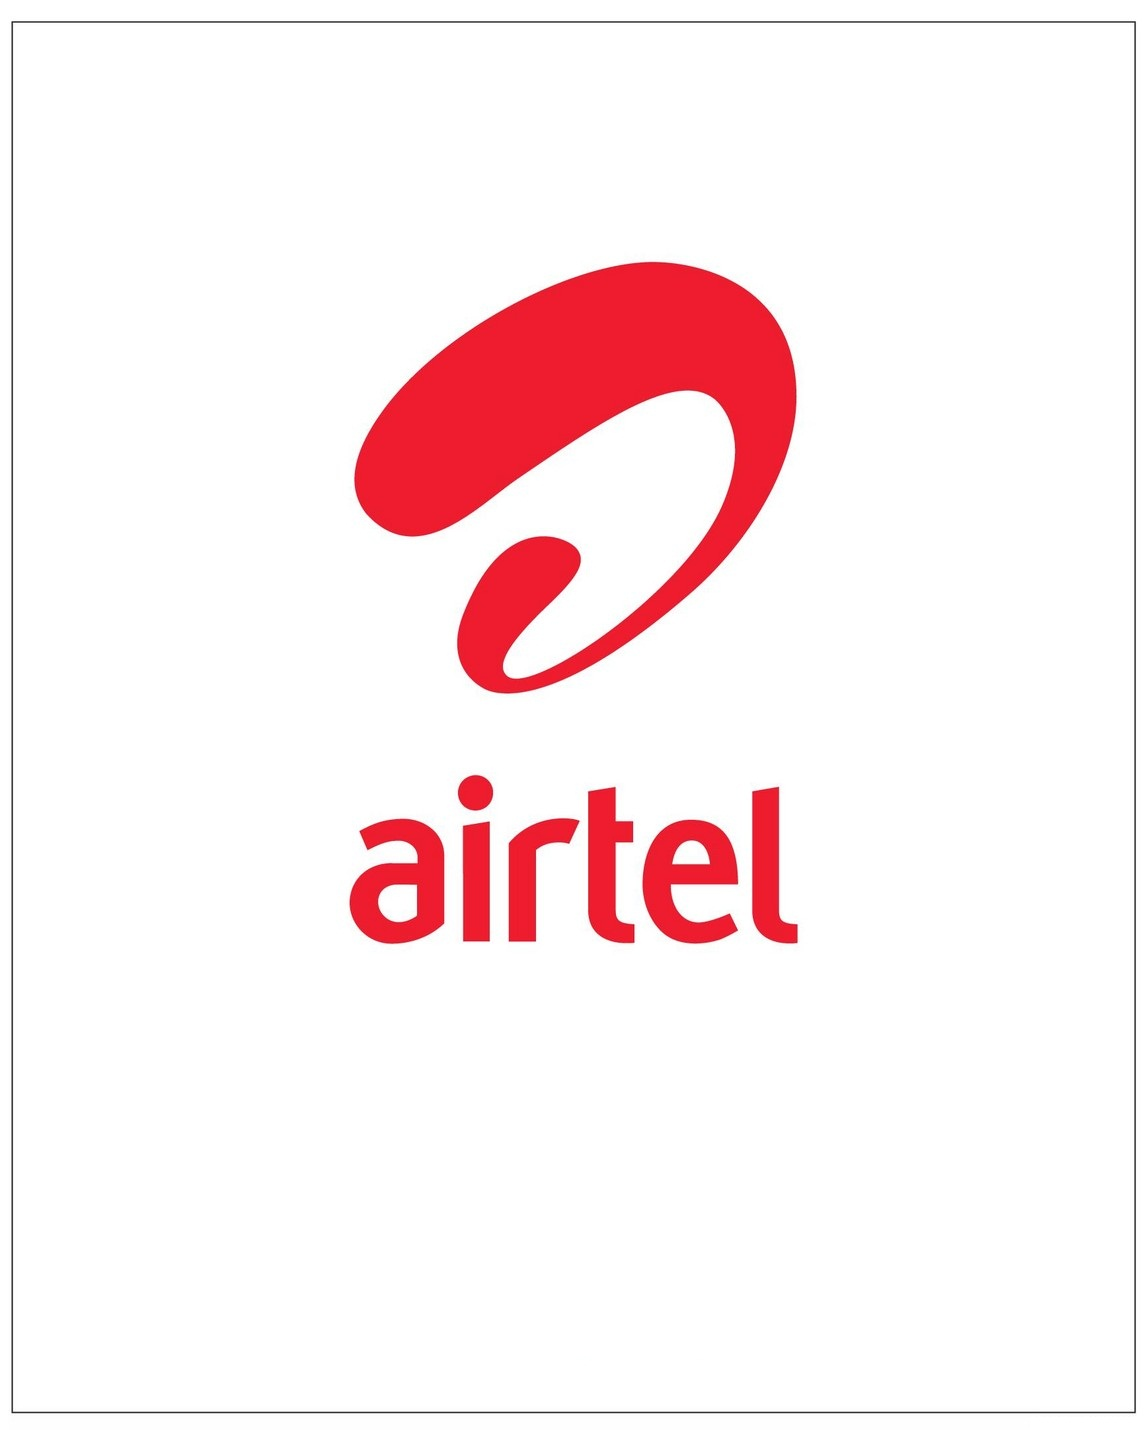 New Post Airtel Free Gprs Operamini Settings New